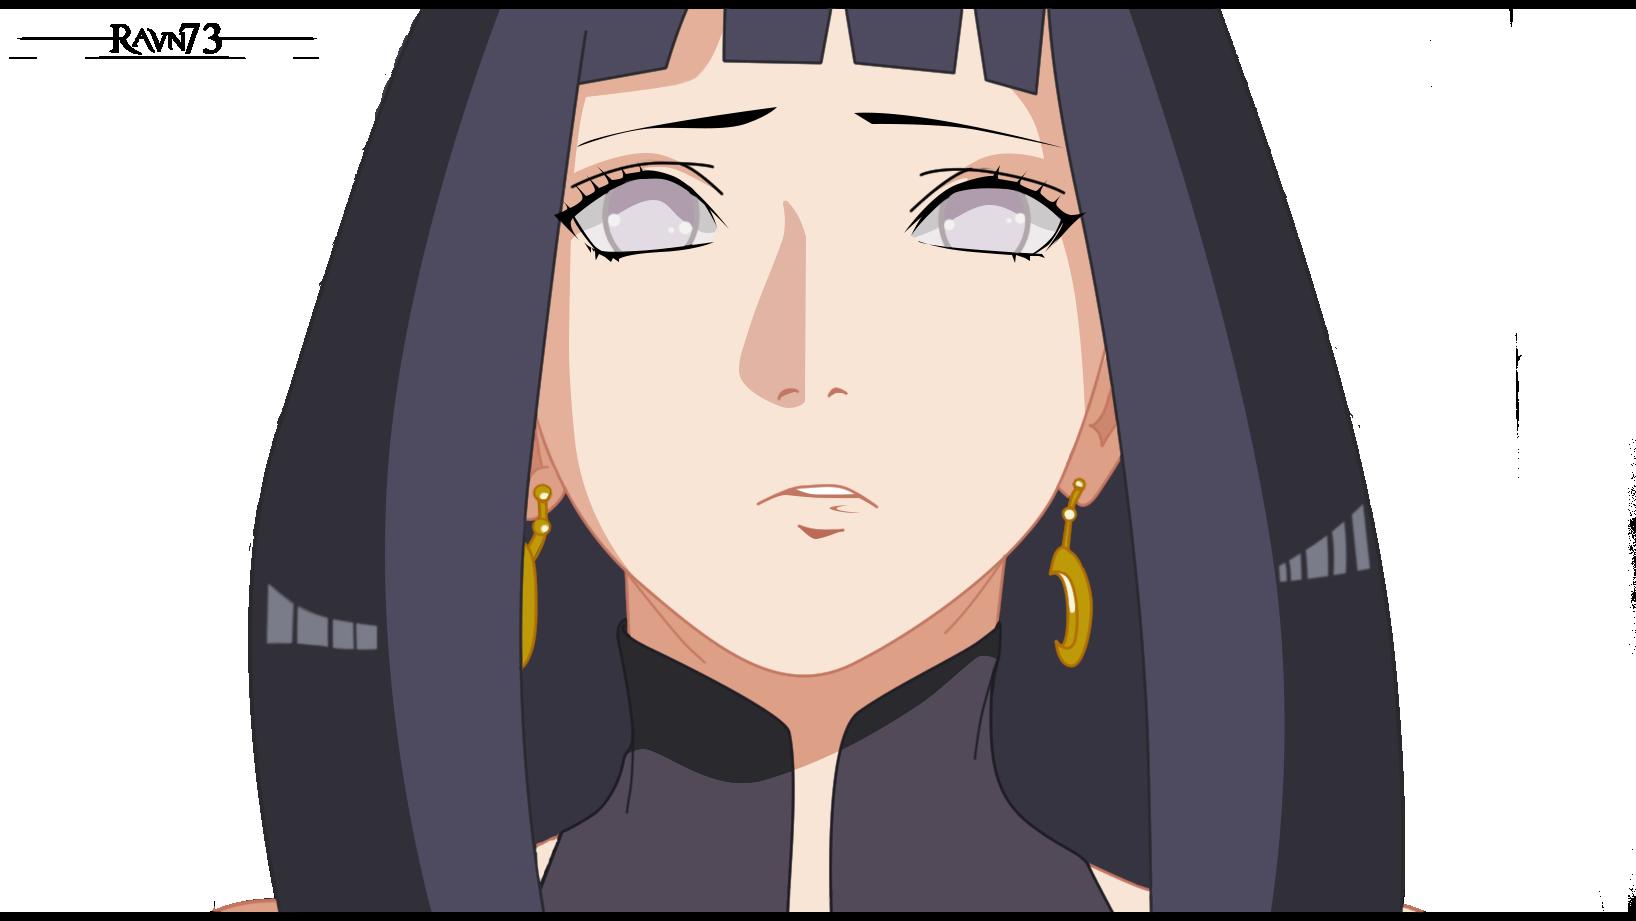 naruto-shippuden-girls-in-black-dresses